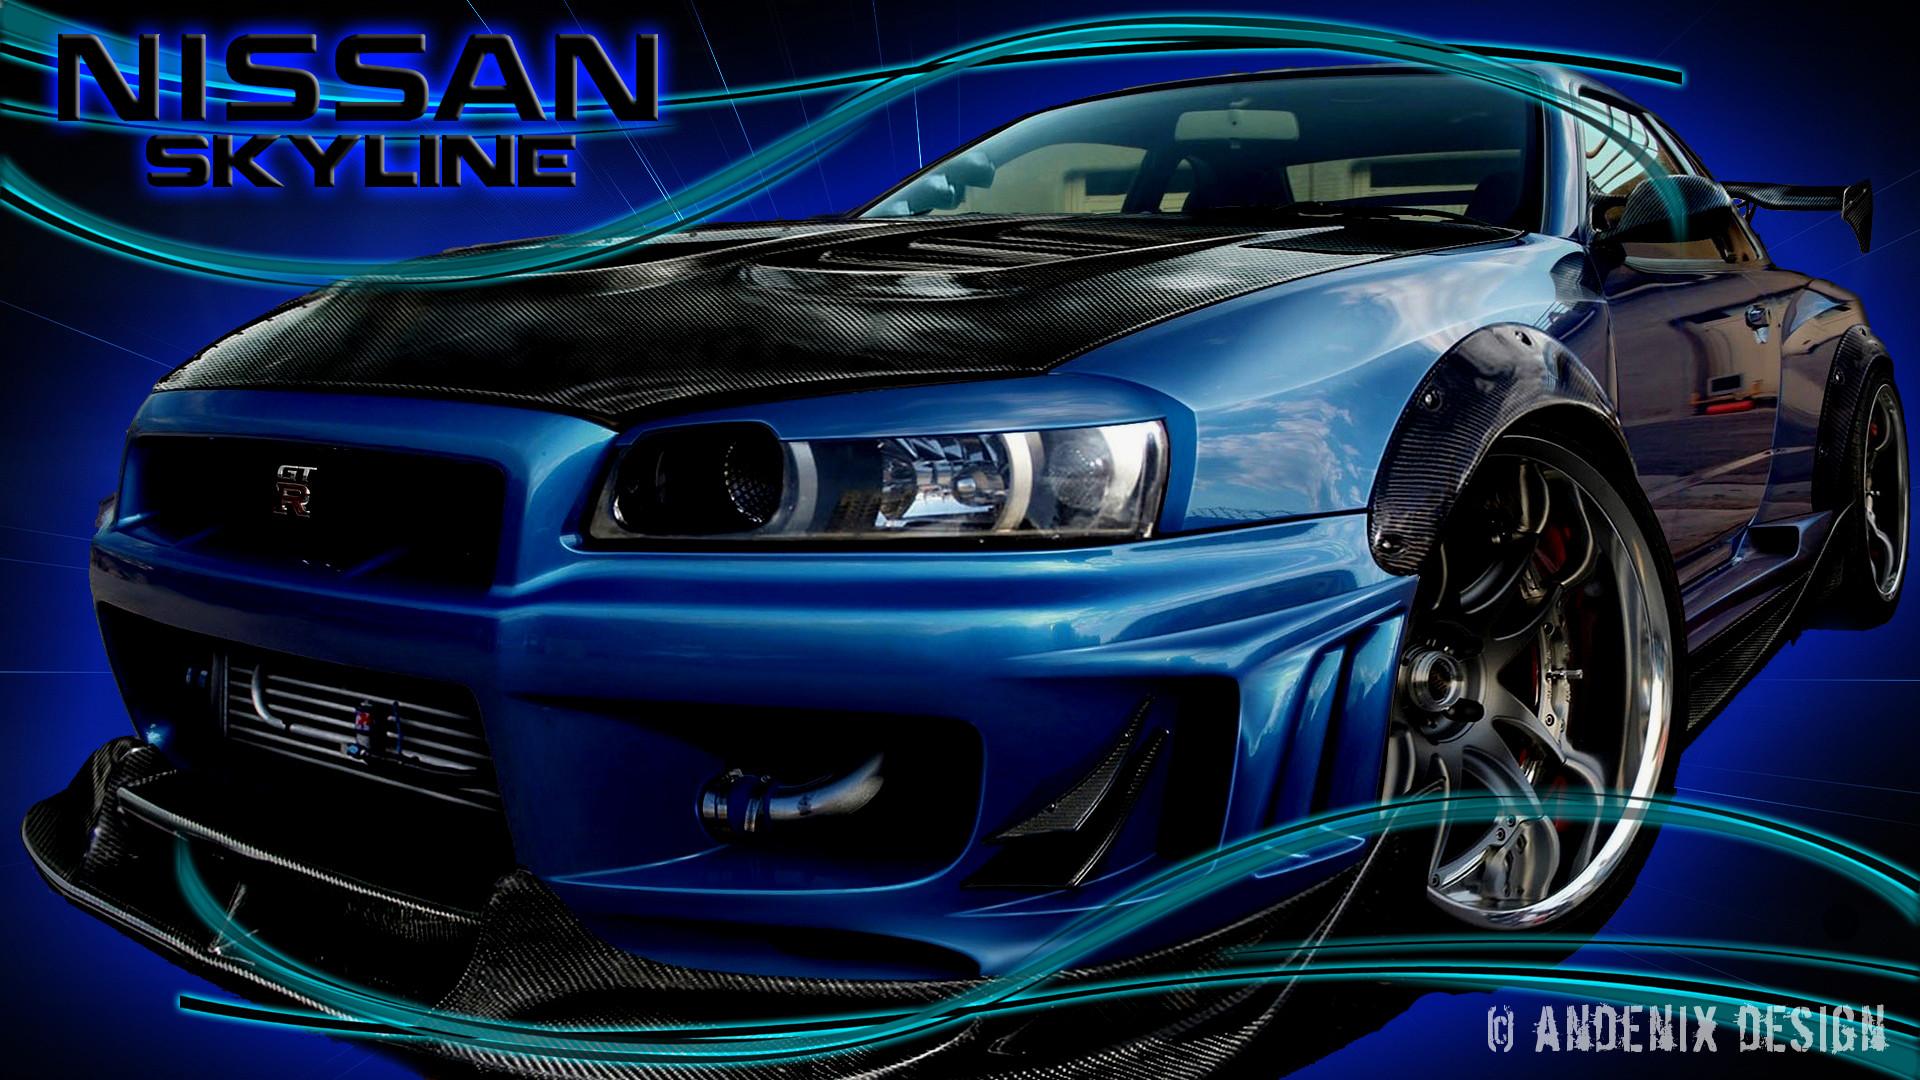 Imagenes De Carros Hd Wallpaper: Nissan Skyline Wallpaper HD (73+ Images